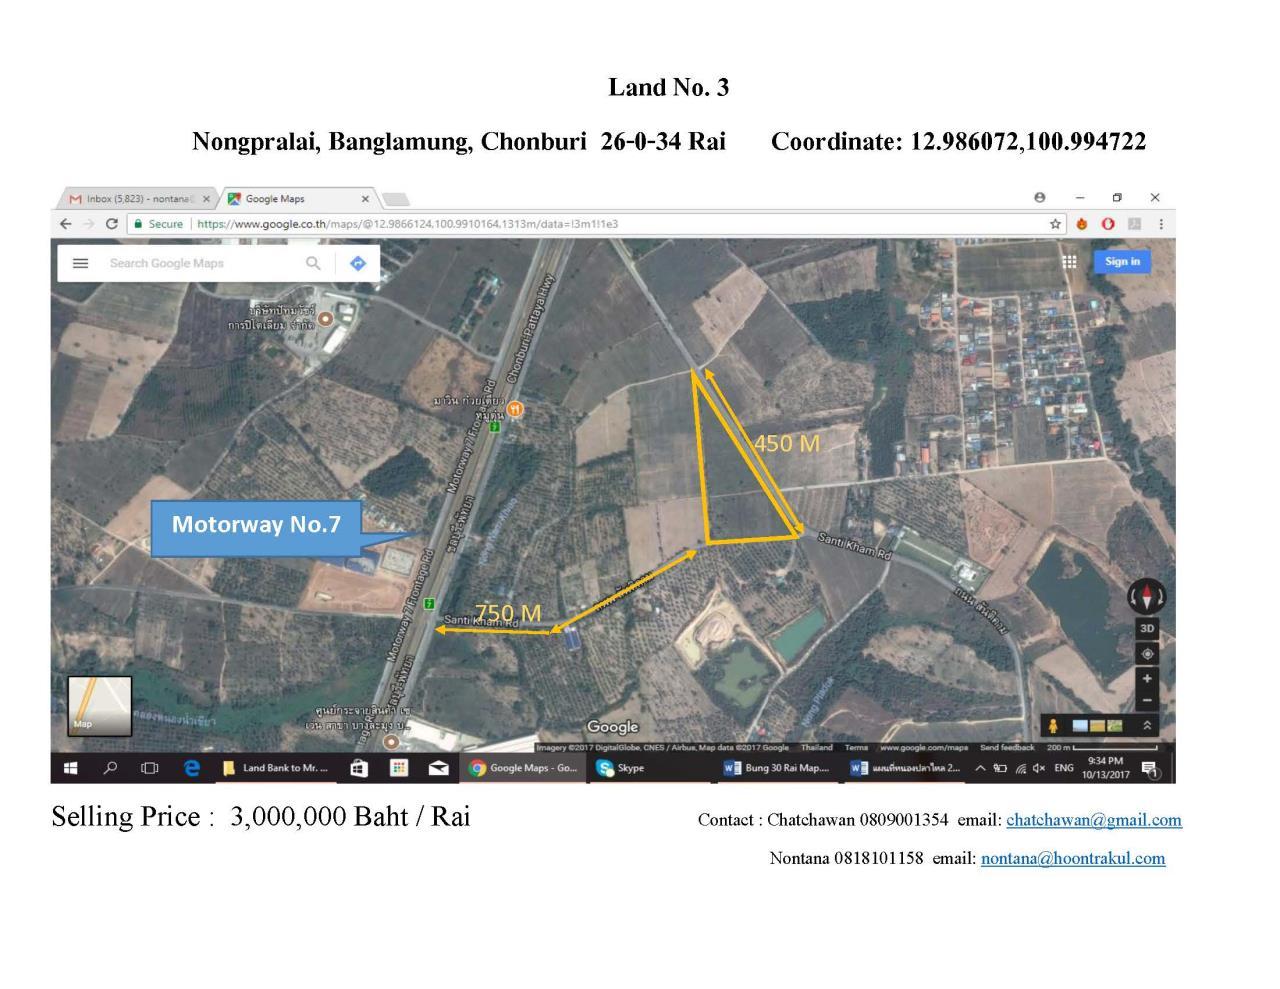 Hoontrakul Corporation Agency's Nongpralai, Banglamung, Chonburi 2